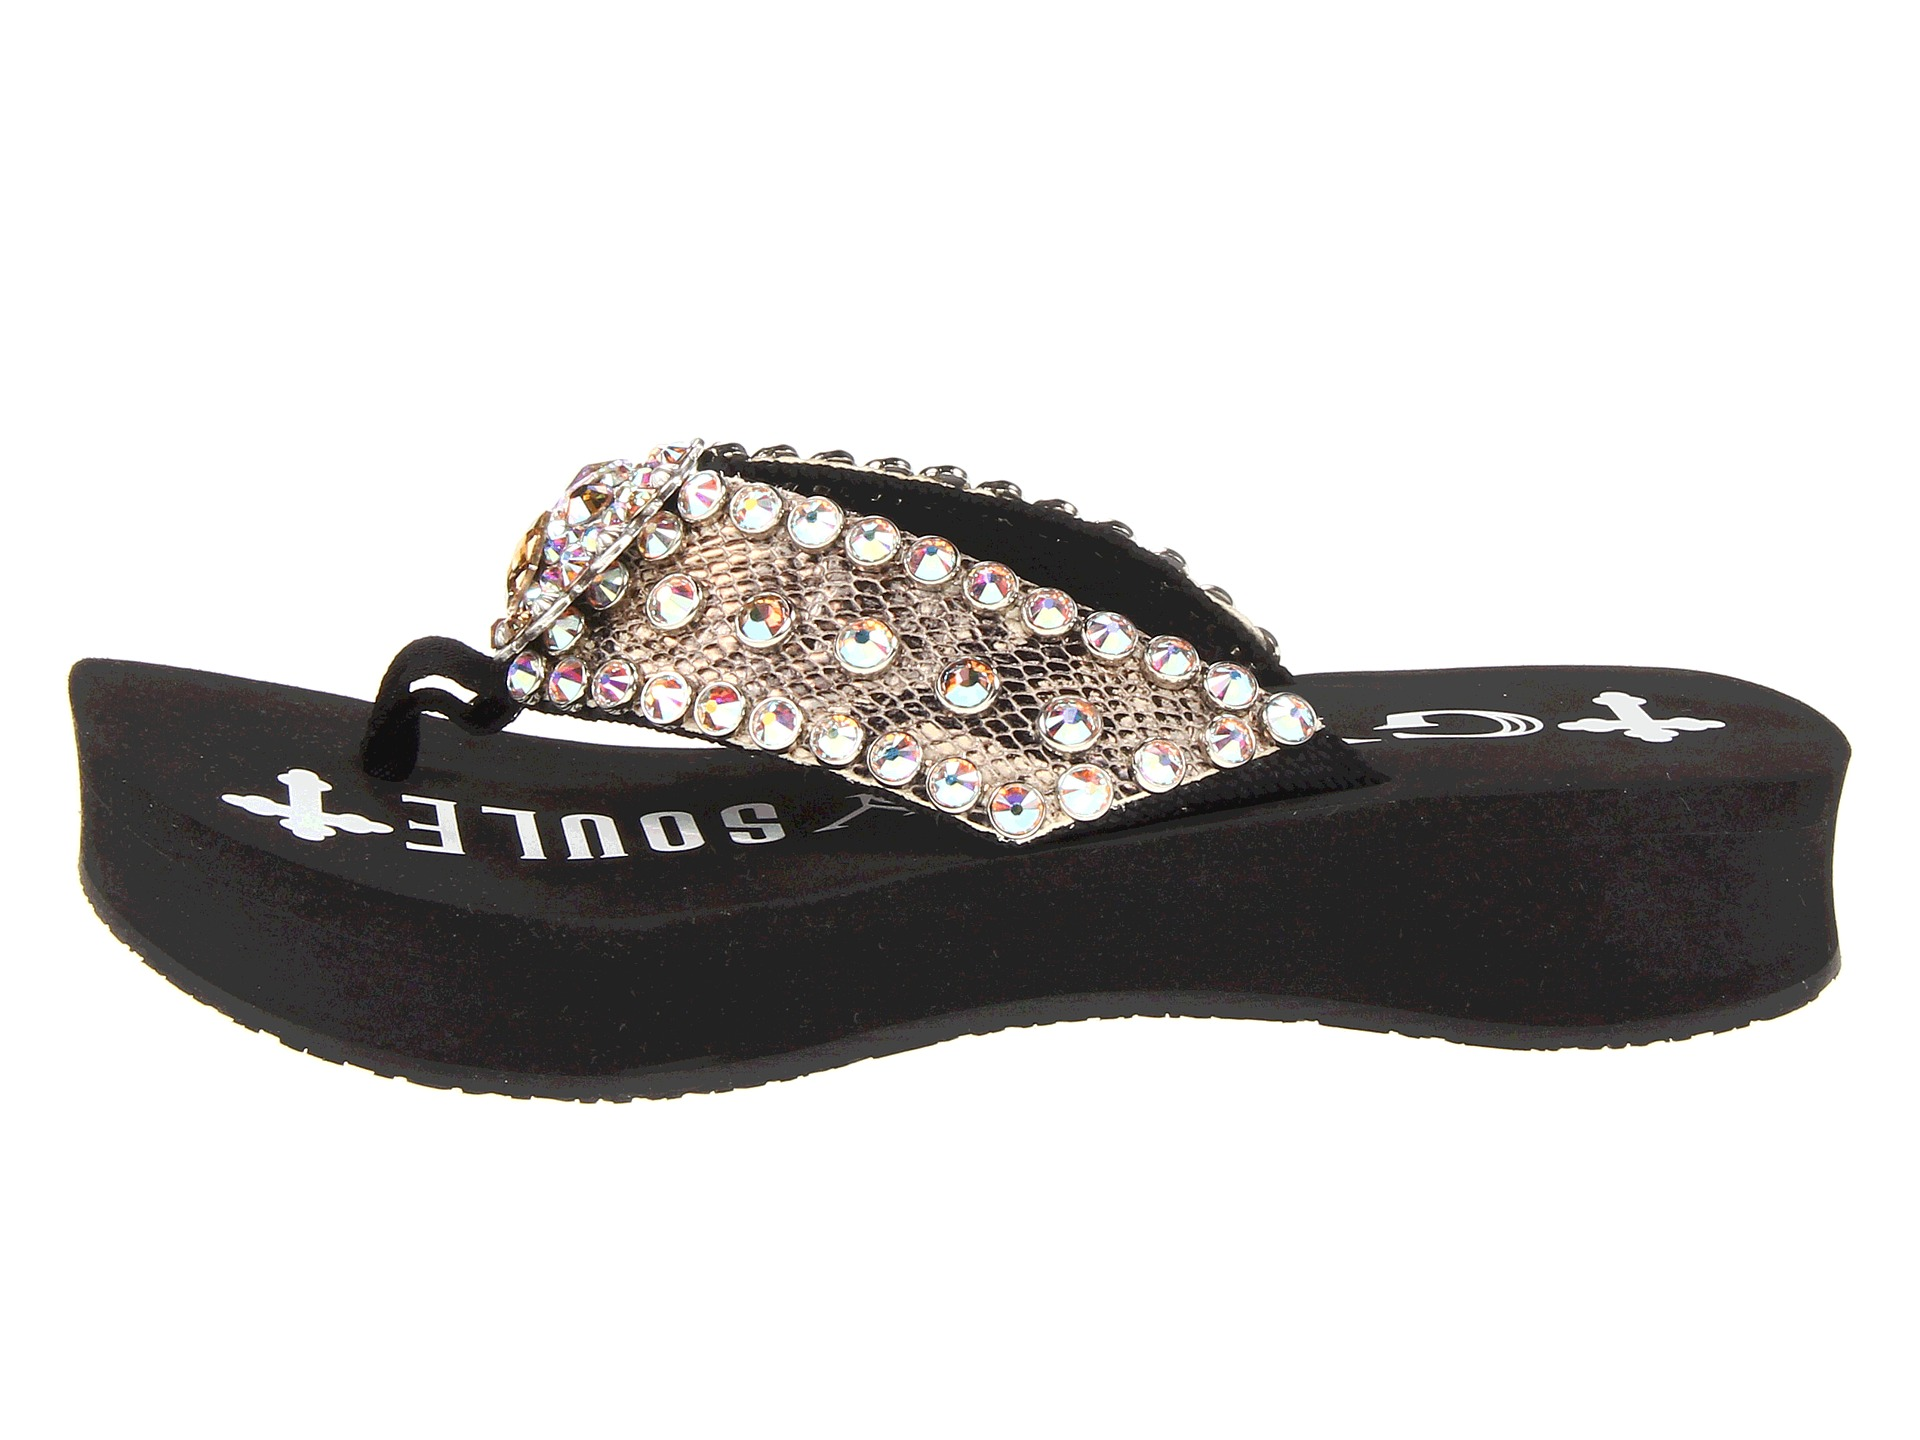 Gypsy Soule Shoes Reviews